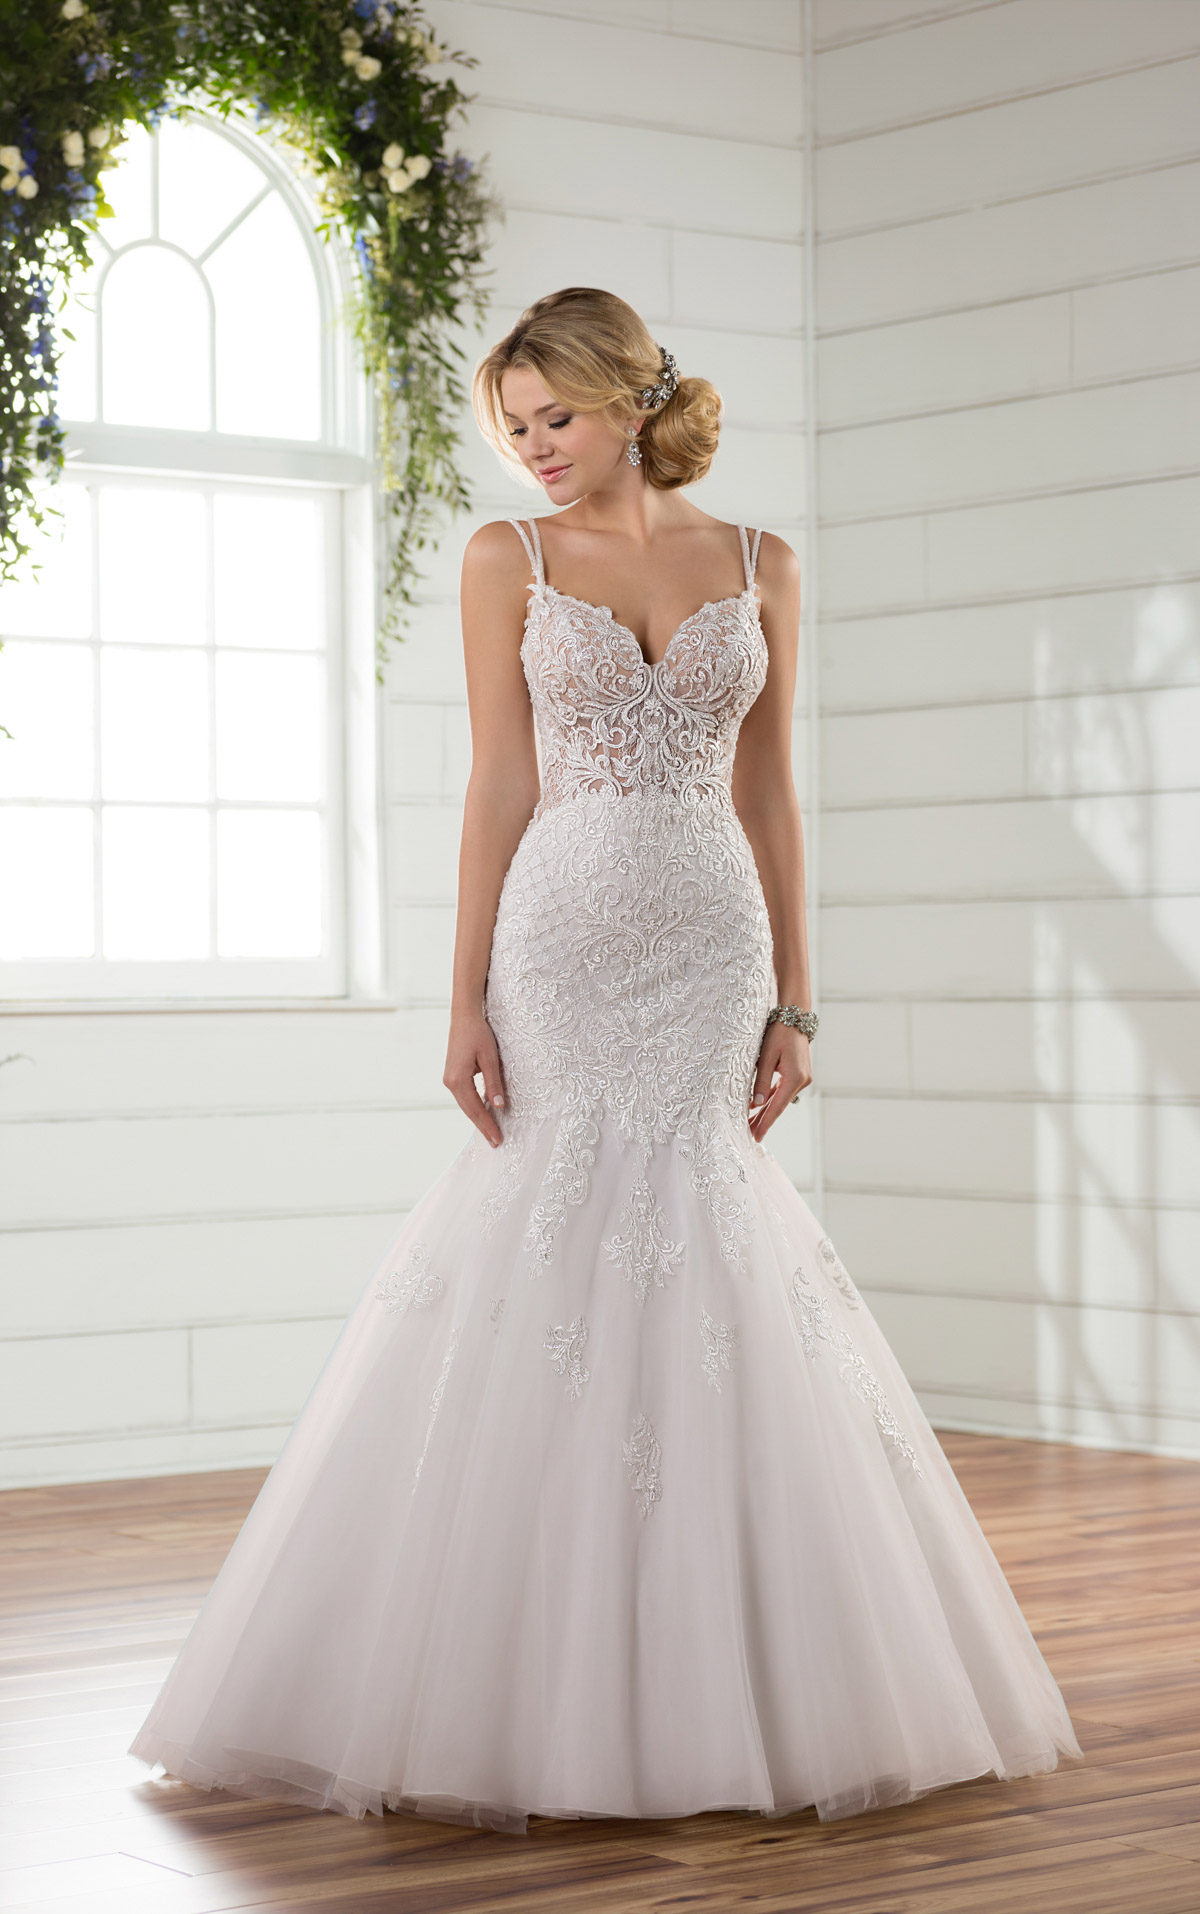 sheer mermaid wedding dresses photo - 1